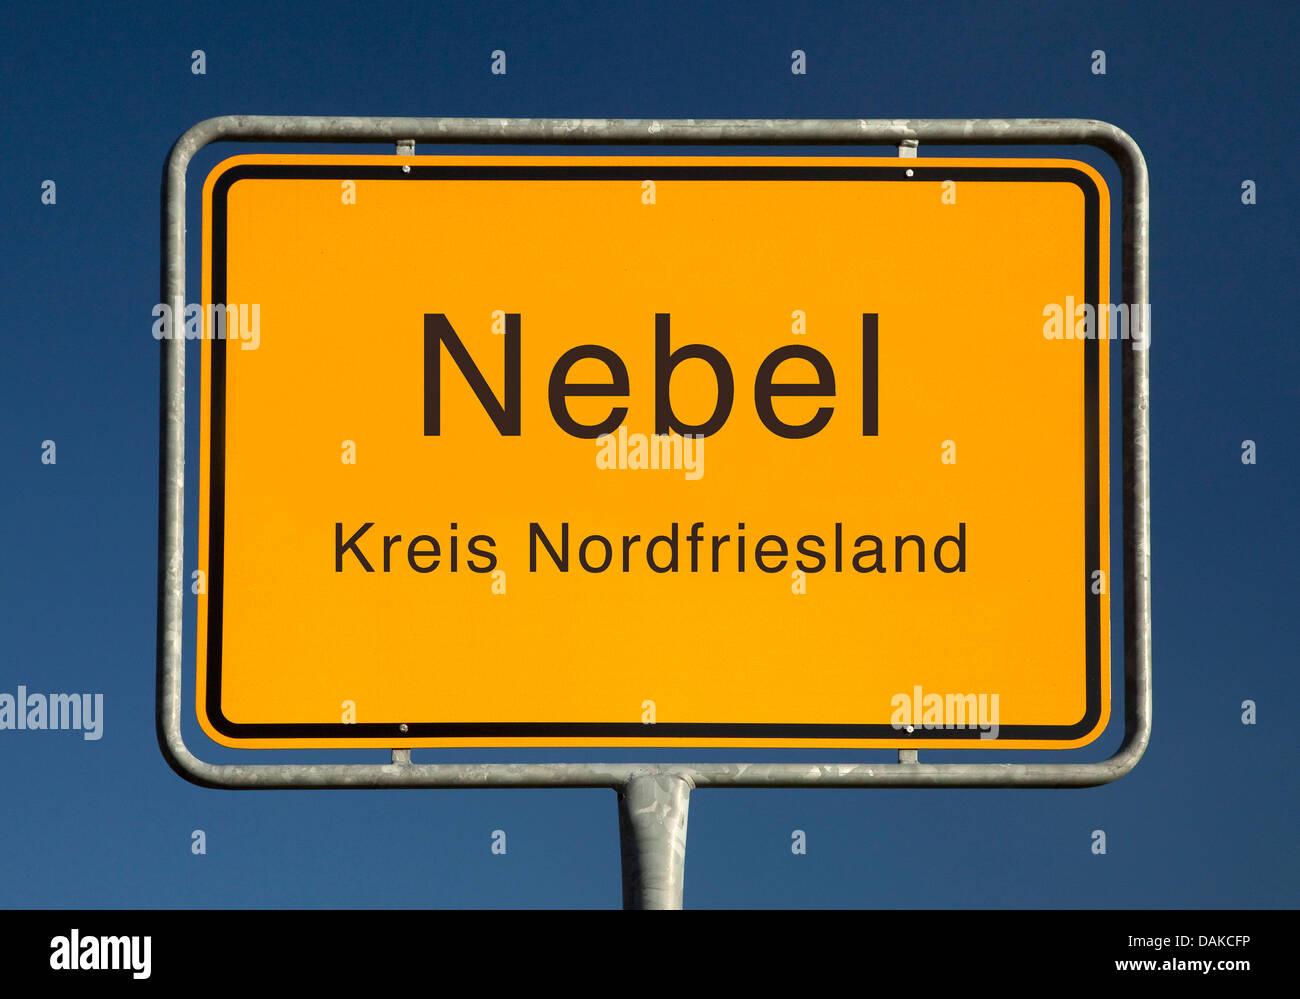 Nebel place name sign, Germany, Schleswig-Holstein, Kreis Nordfriesland, Nebel - Stock Image